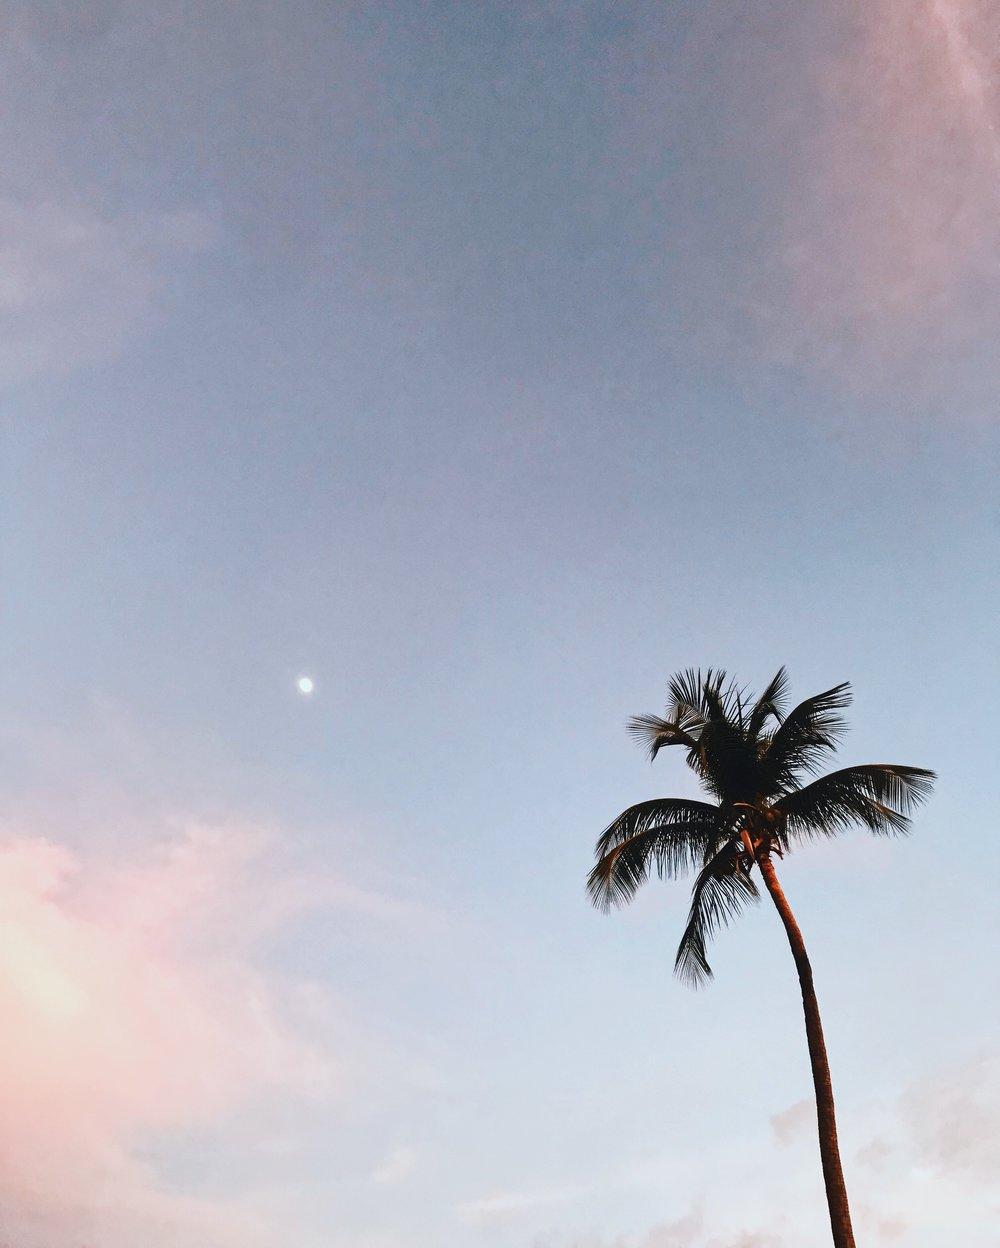 Palm Tree_CaymanIslands